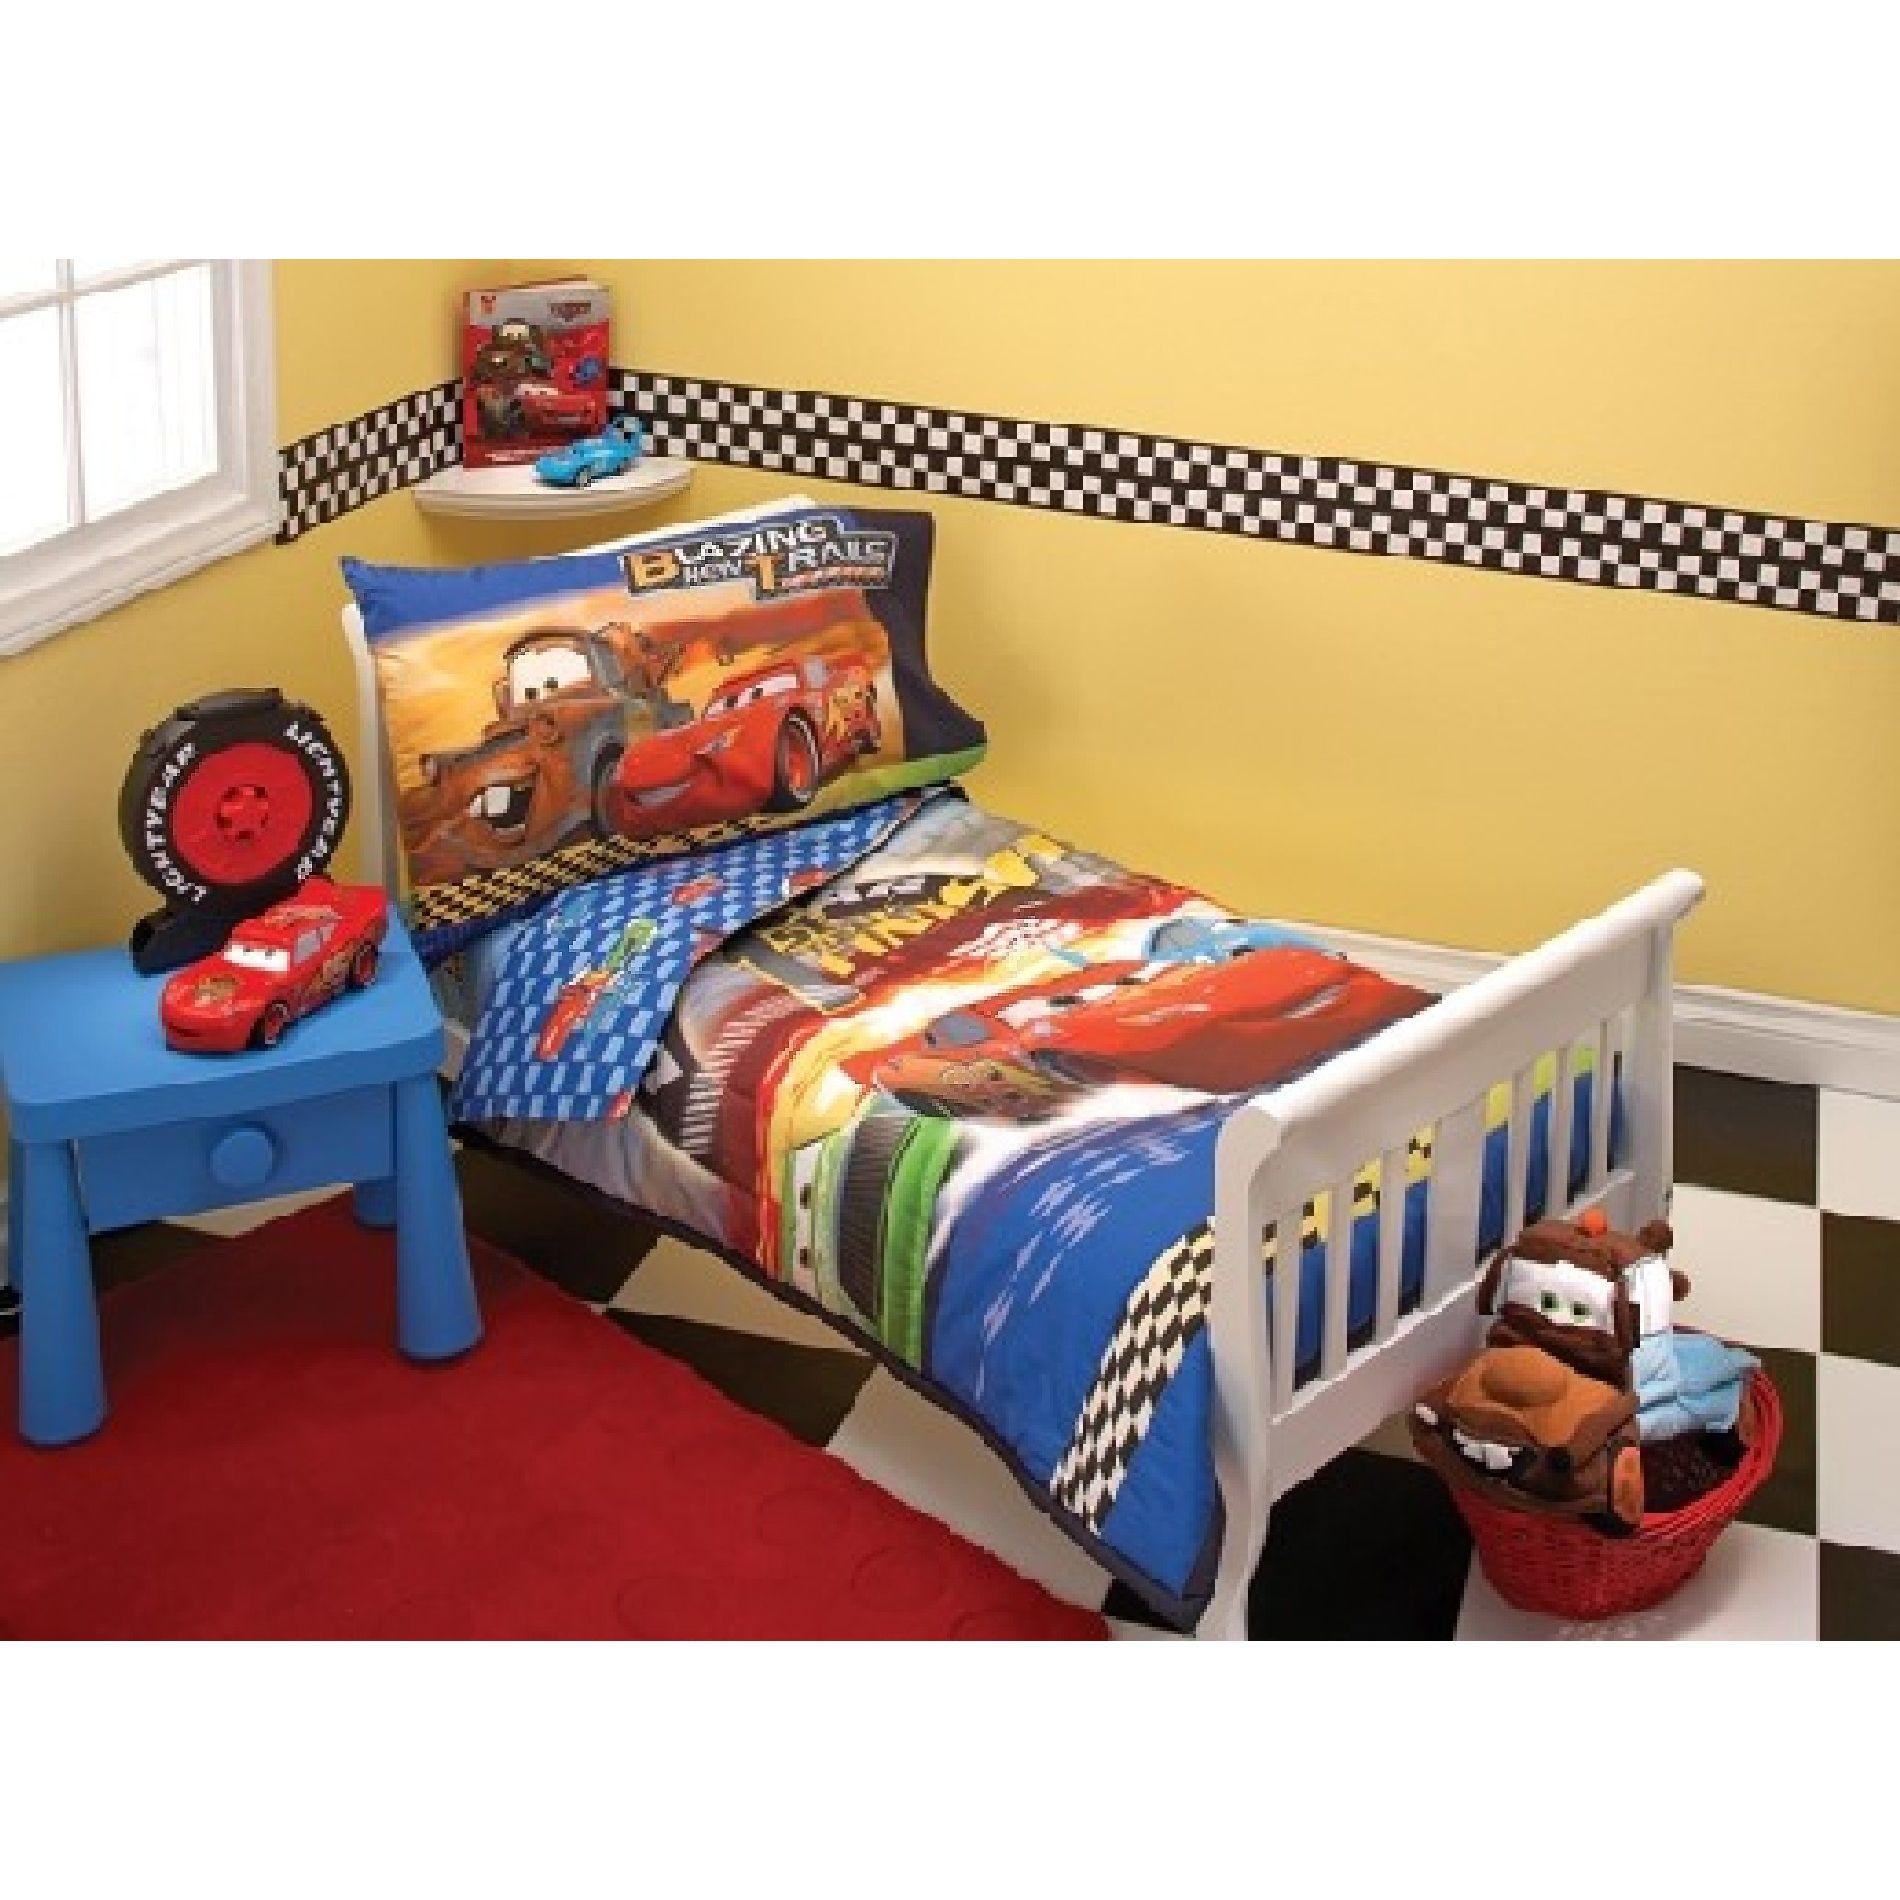 Mixed Brands Toddler Bedding Set Disney Cars 1st Finish